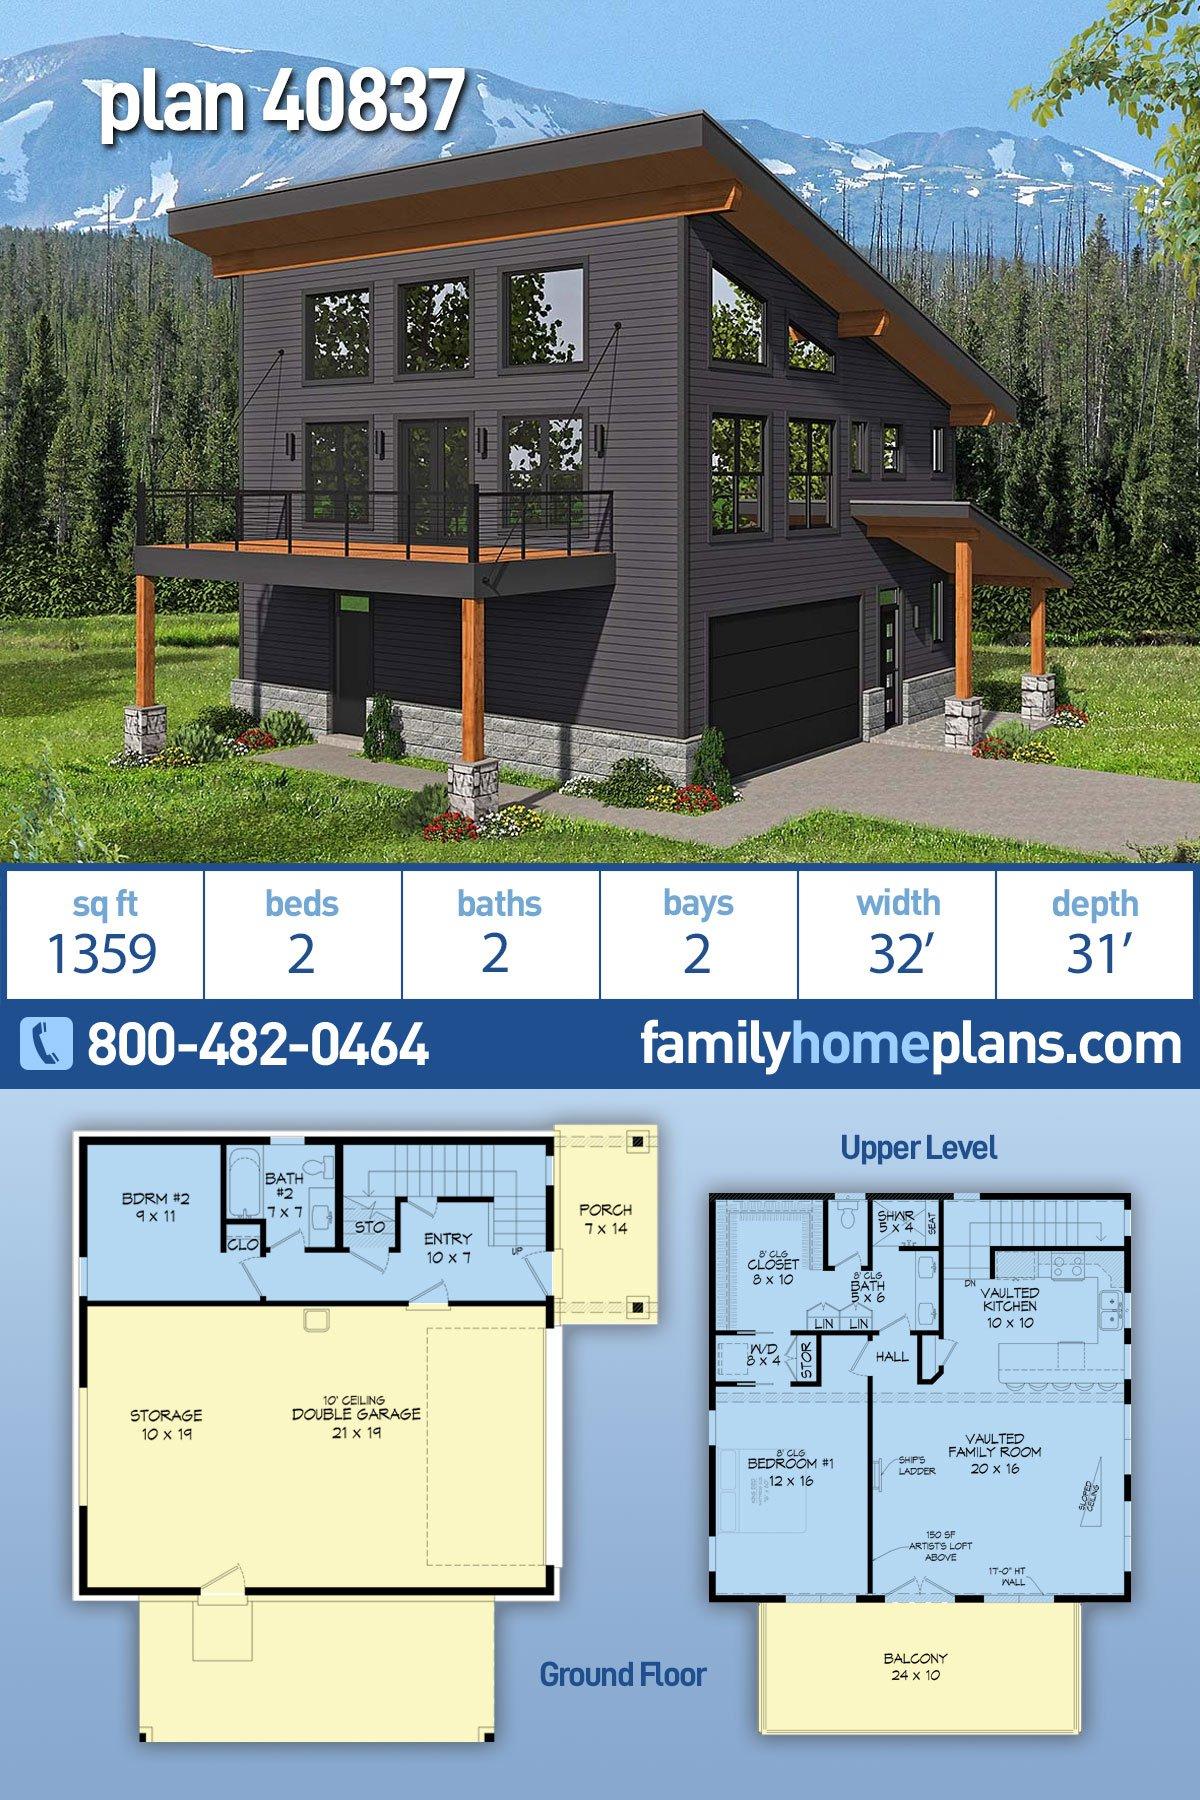 Contemporary, Modern 2 Car Garage Apartment Plan 40837 with 2 Beds, 2 Baths